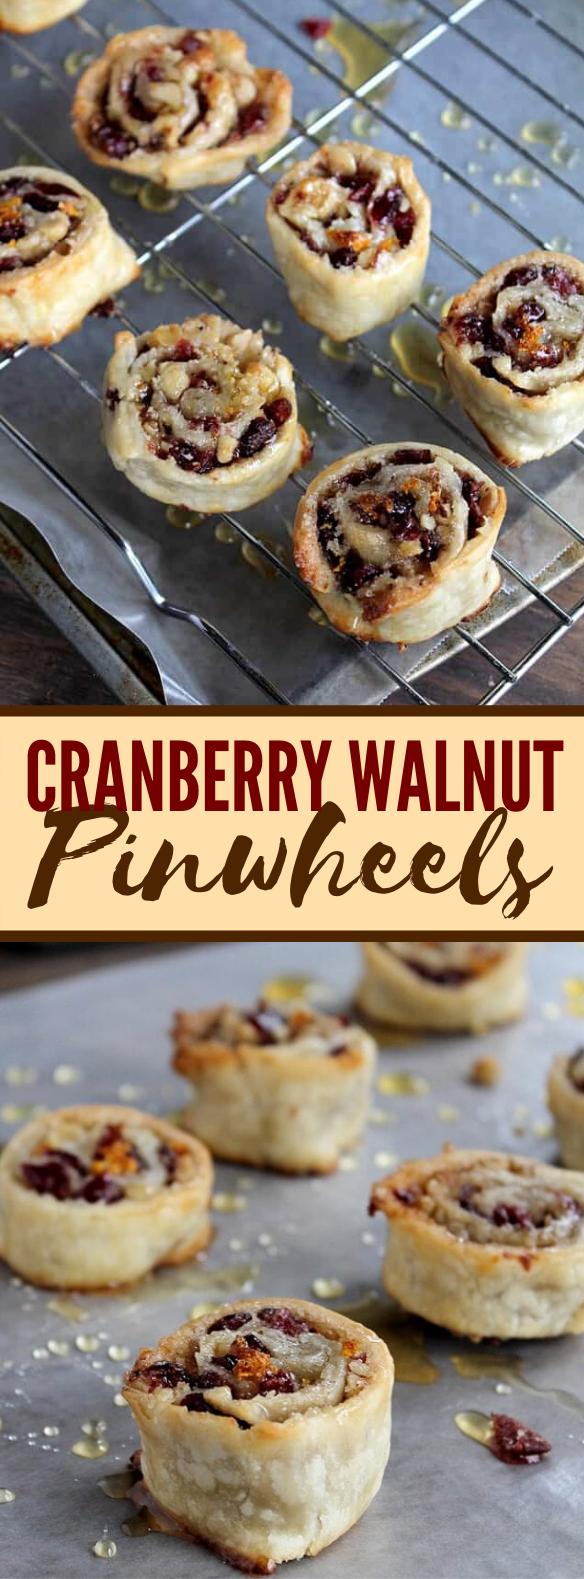 Cranberry and Walnut Pinwheels #desserts #holidayrecipes